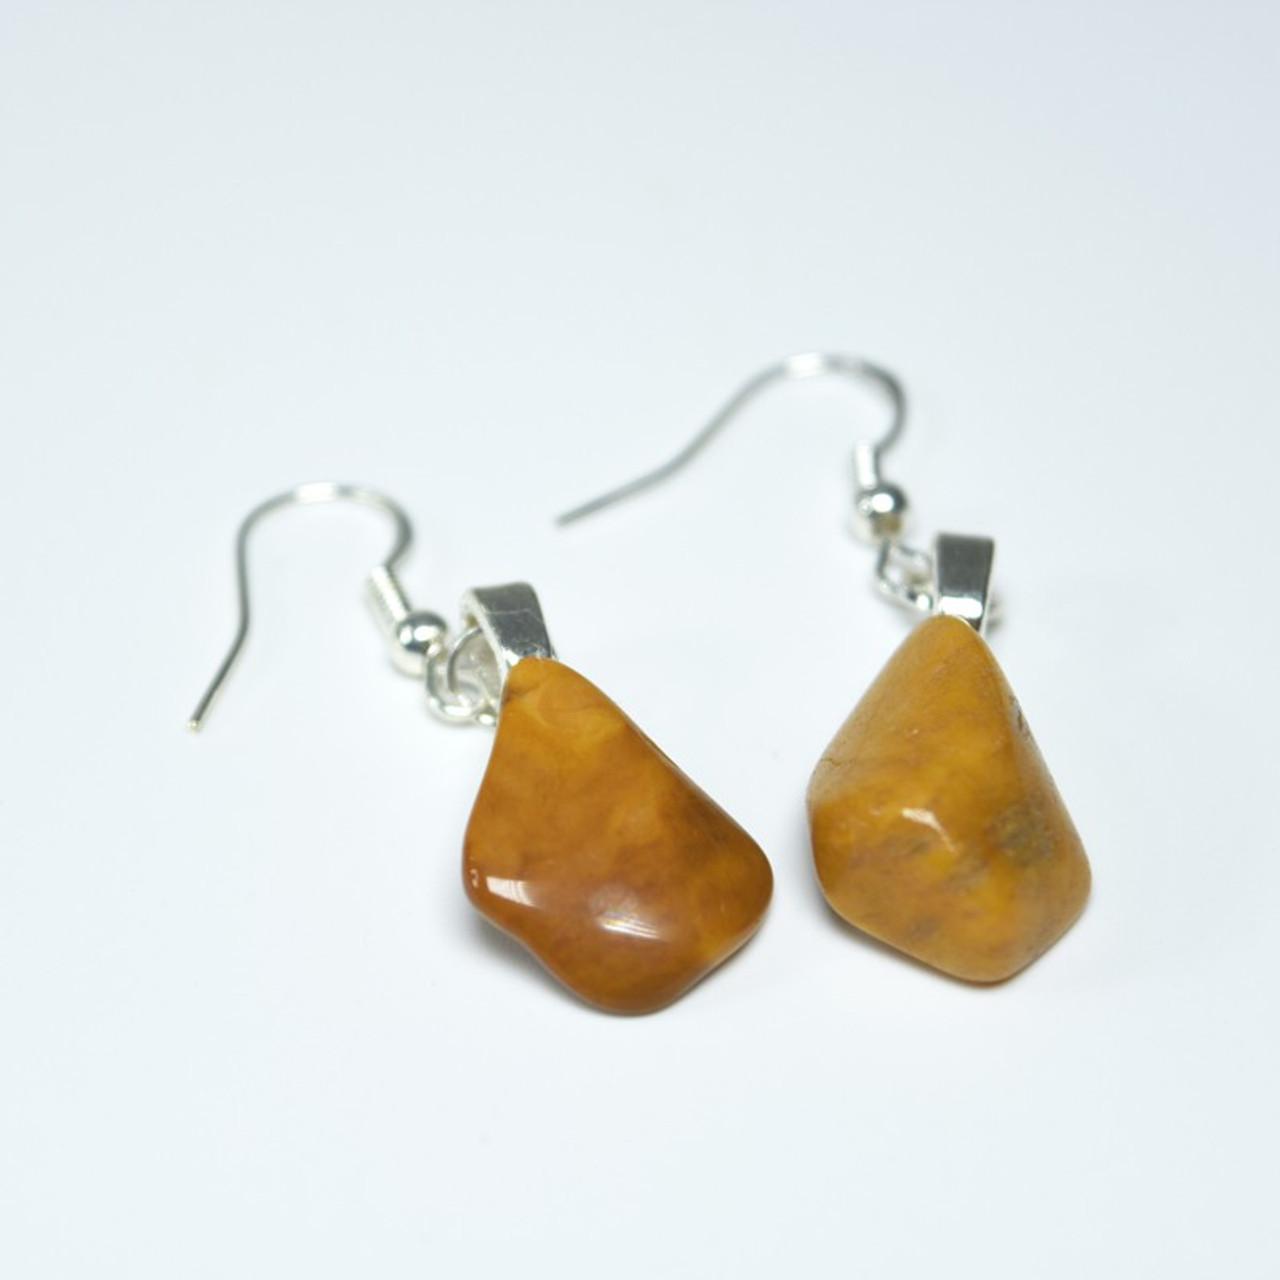 Tumbled Yellow Jasper Stone Earrings